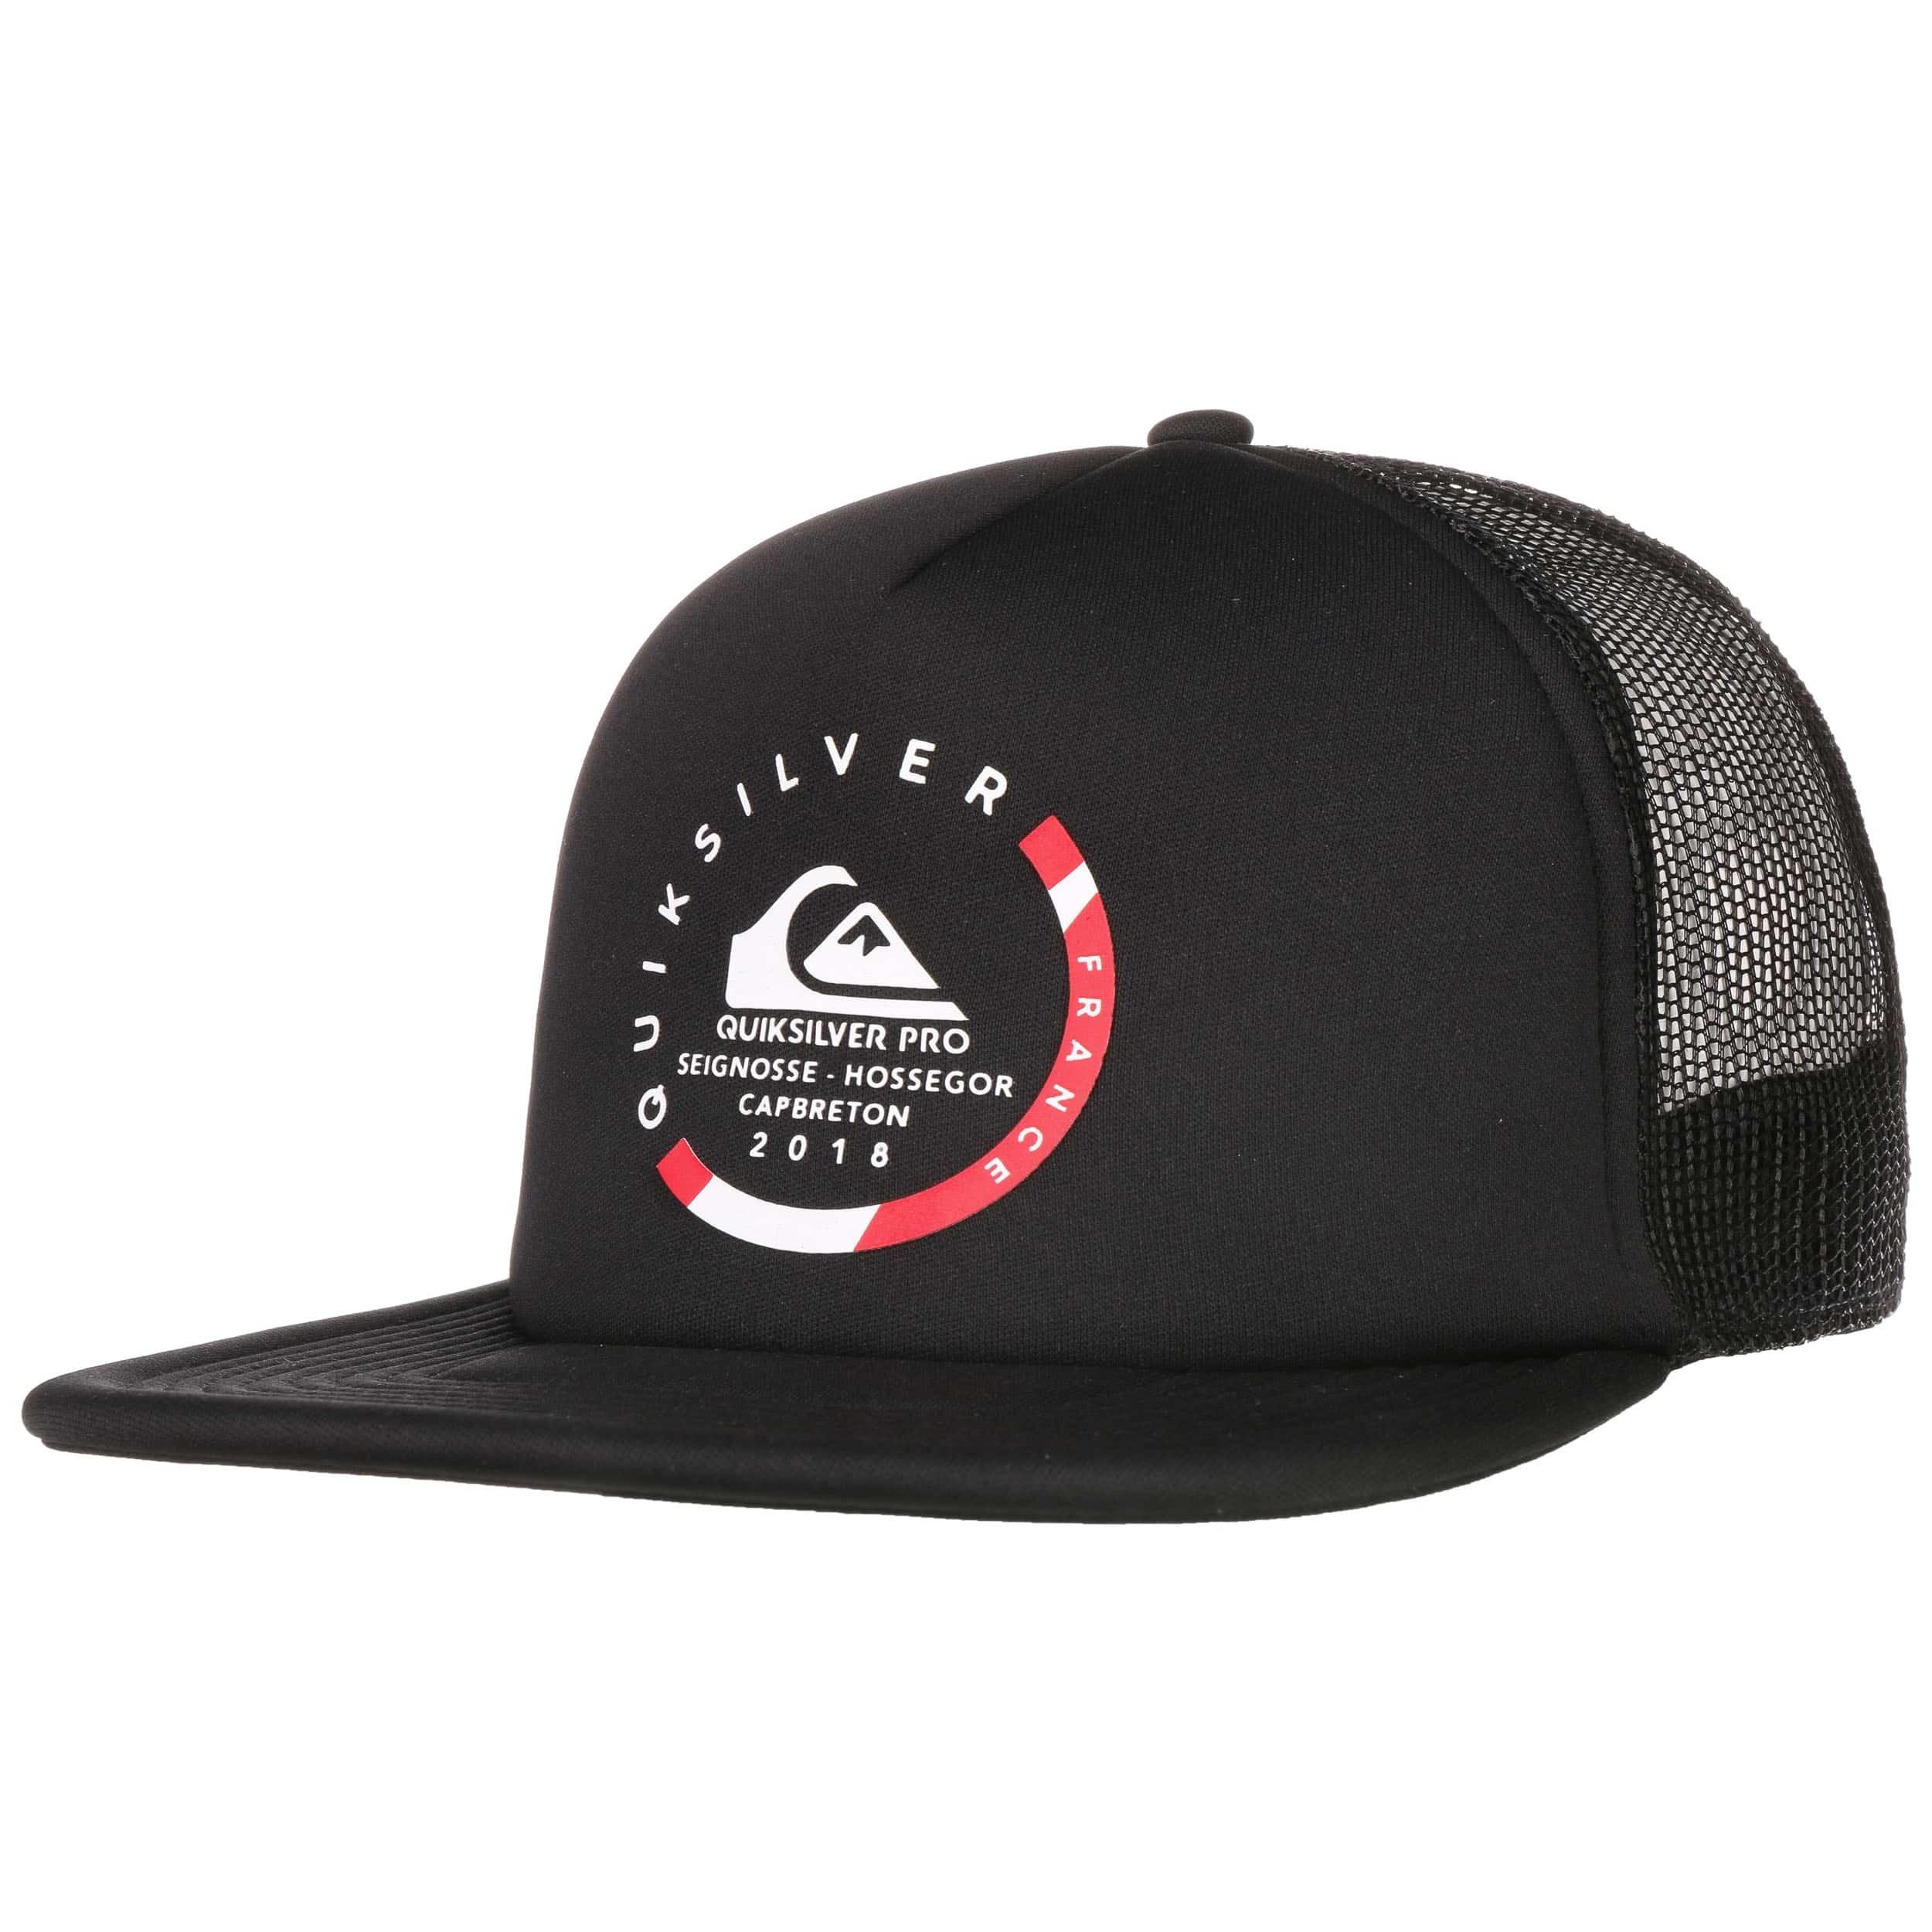 Gorra Trucker Quik Pro France by Quiksilver - Gorras - sombreroshop.es fefc2bb82ca